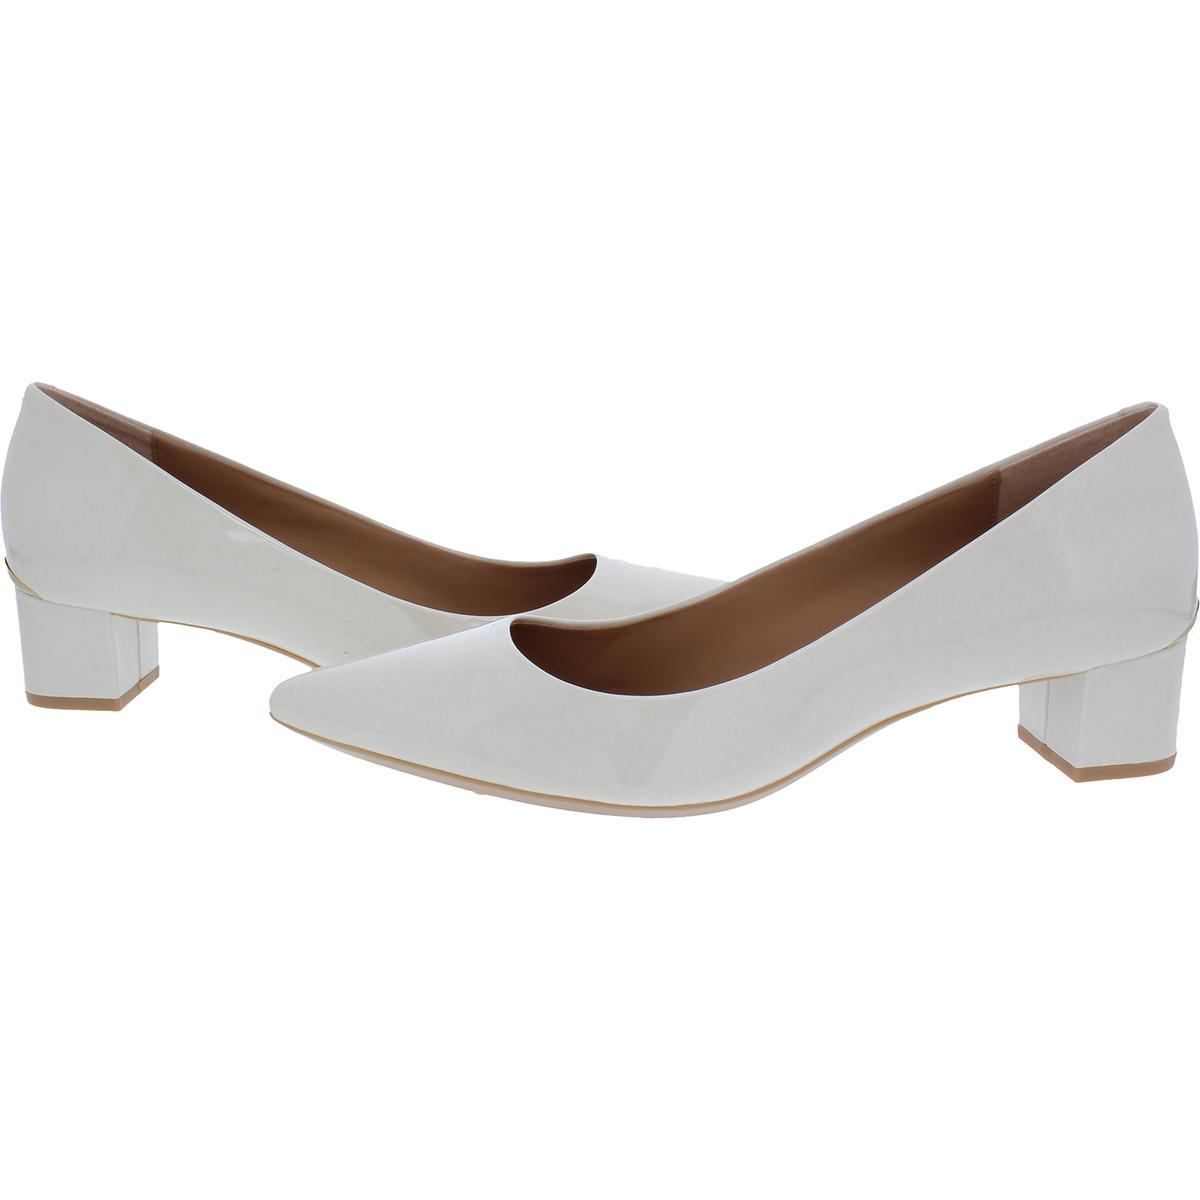 Calvin Klein Damenschuhe Genoveva Pointed Toe Contrast Trim Block Heels BHFO 3183